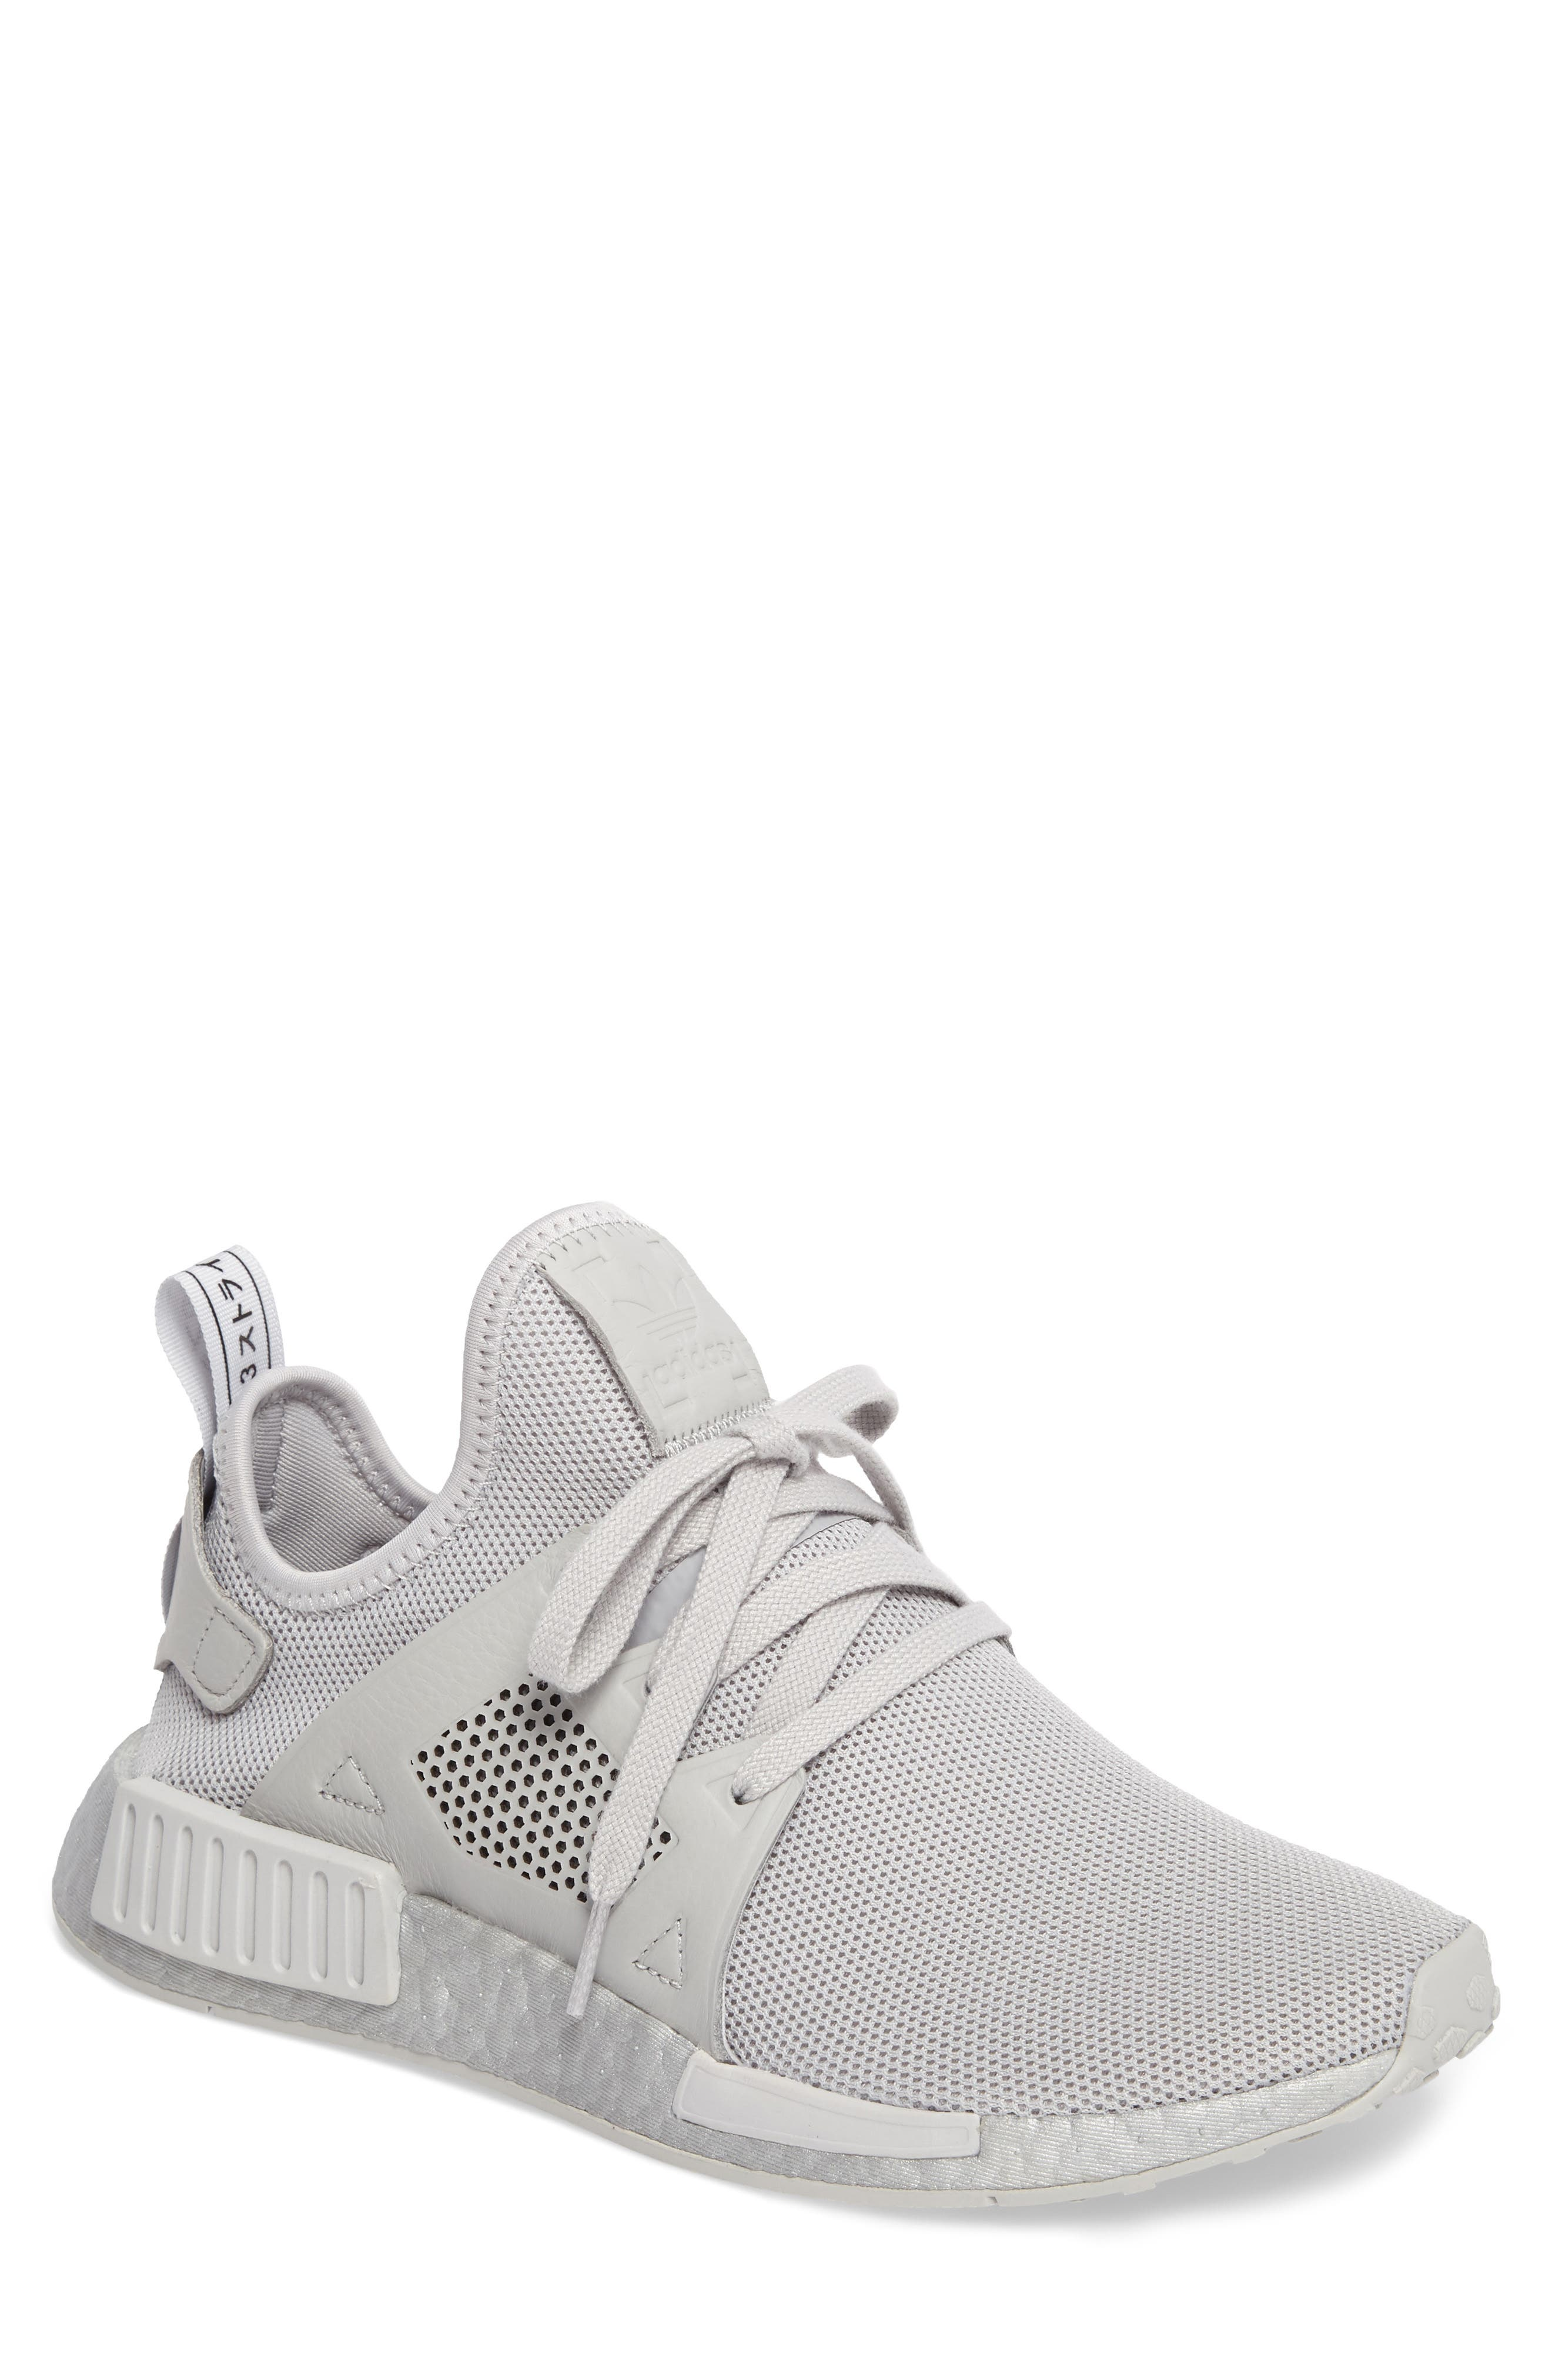 NMD XR1 Sneaker,                             Main thumbnail 1, color,                             020